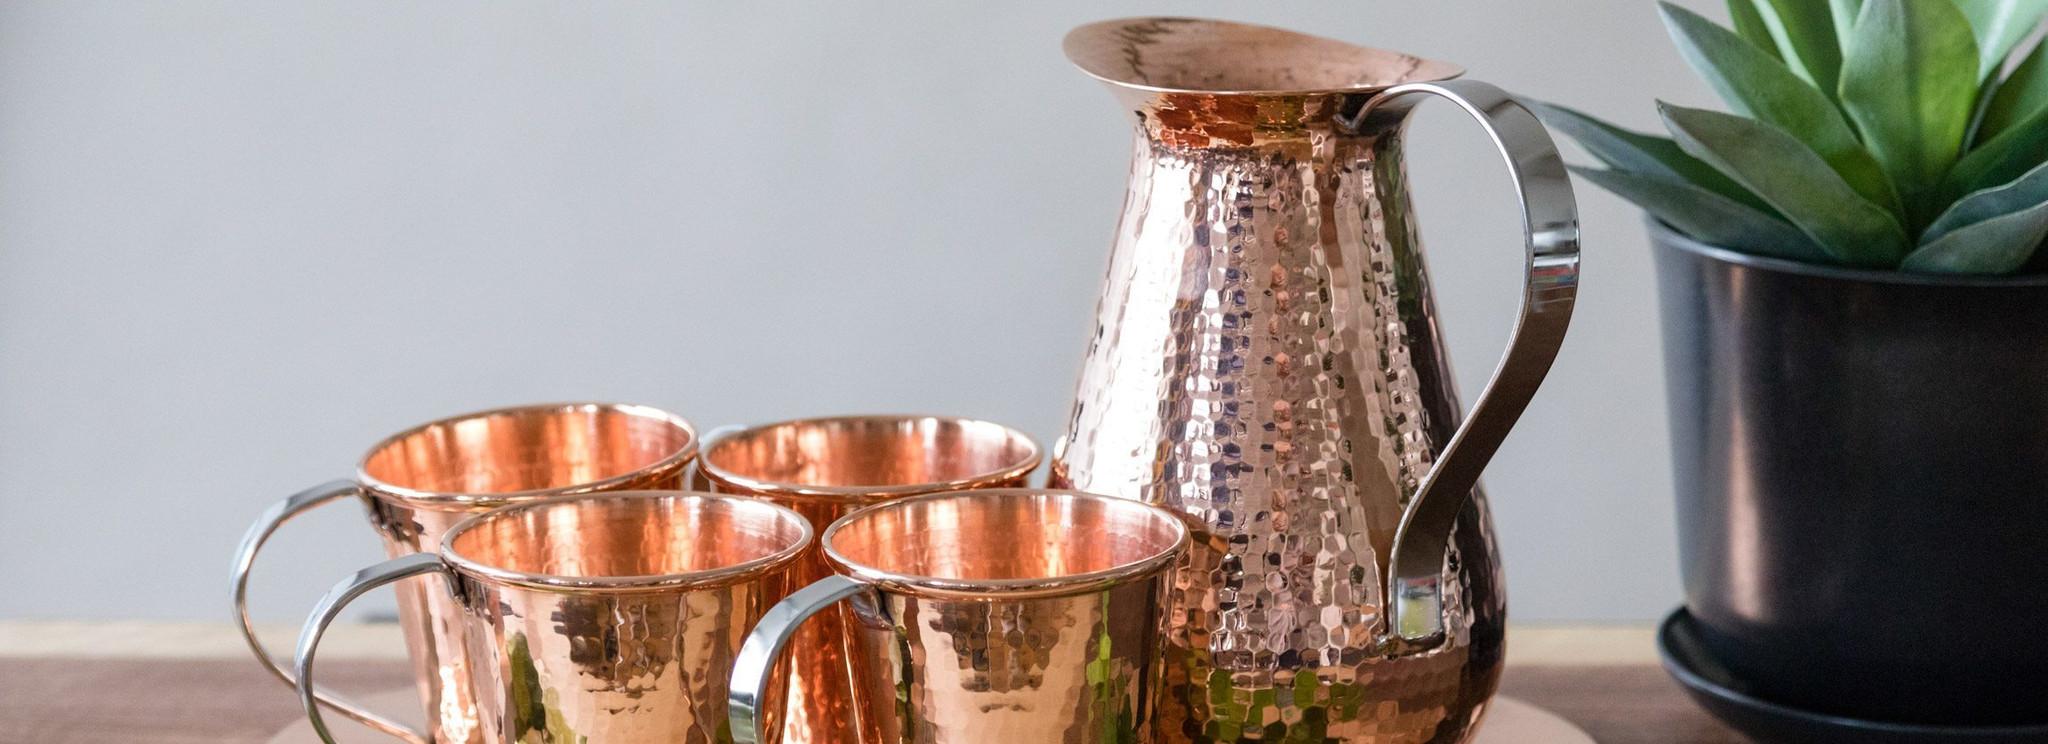 Handmade Copper Drinkware Sets